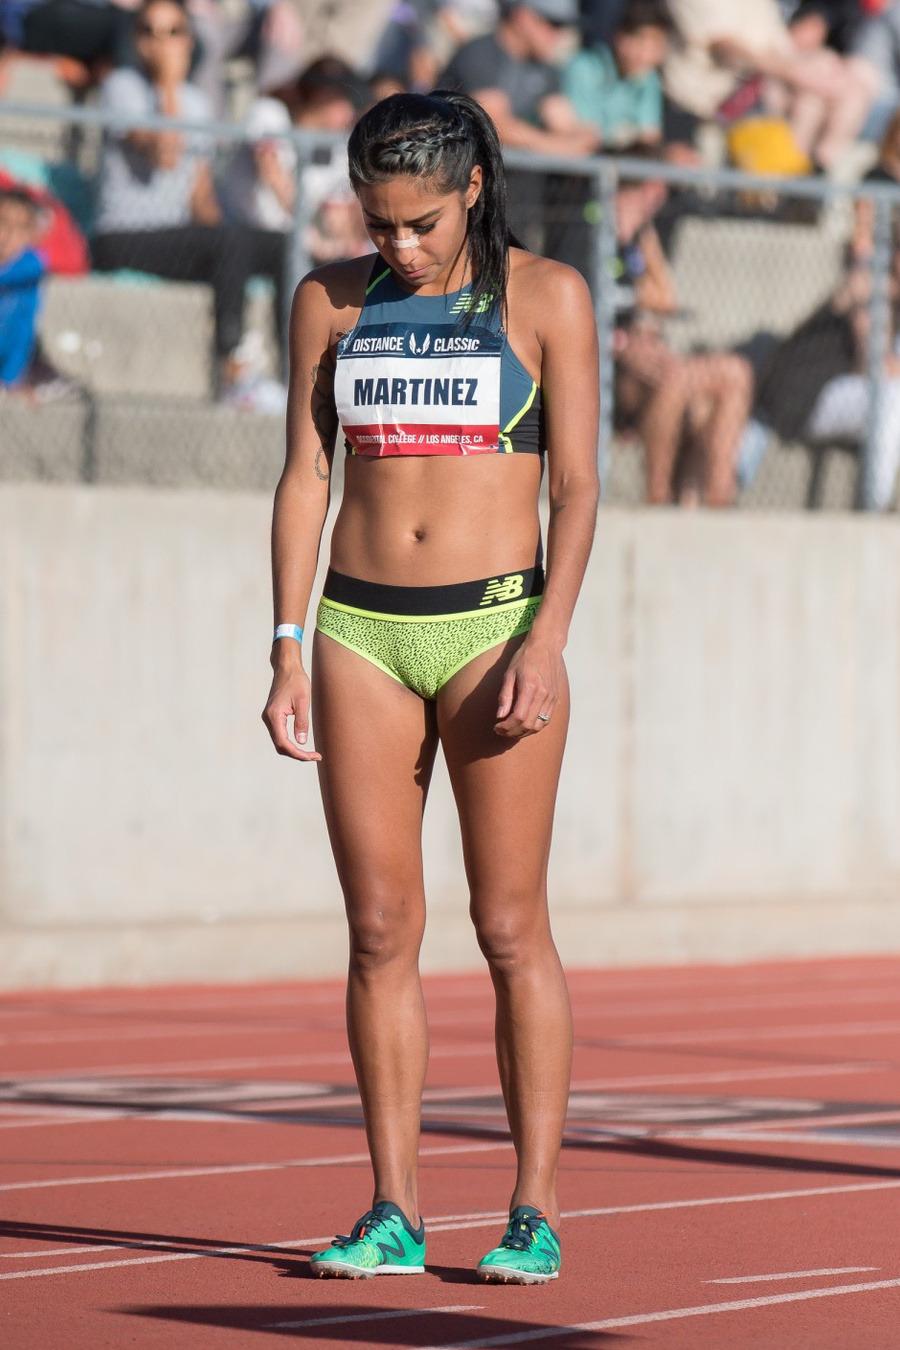 Brenda Martinez 2017 USATF Distance Classic – Gymnastics